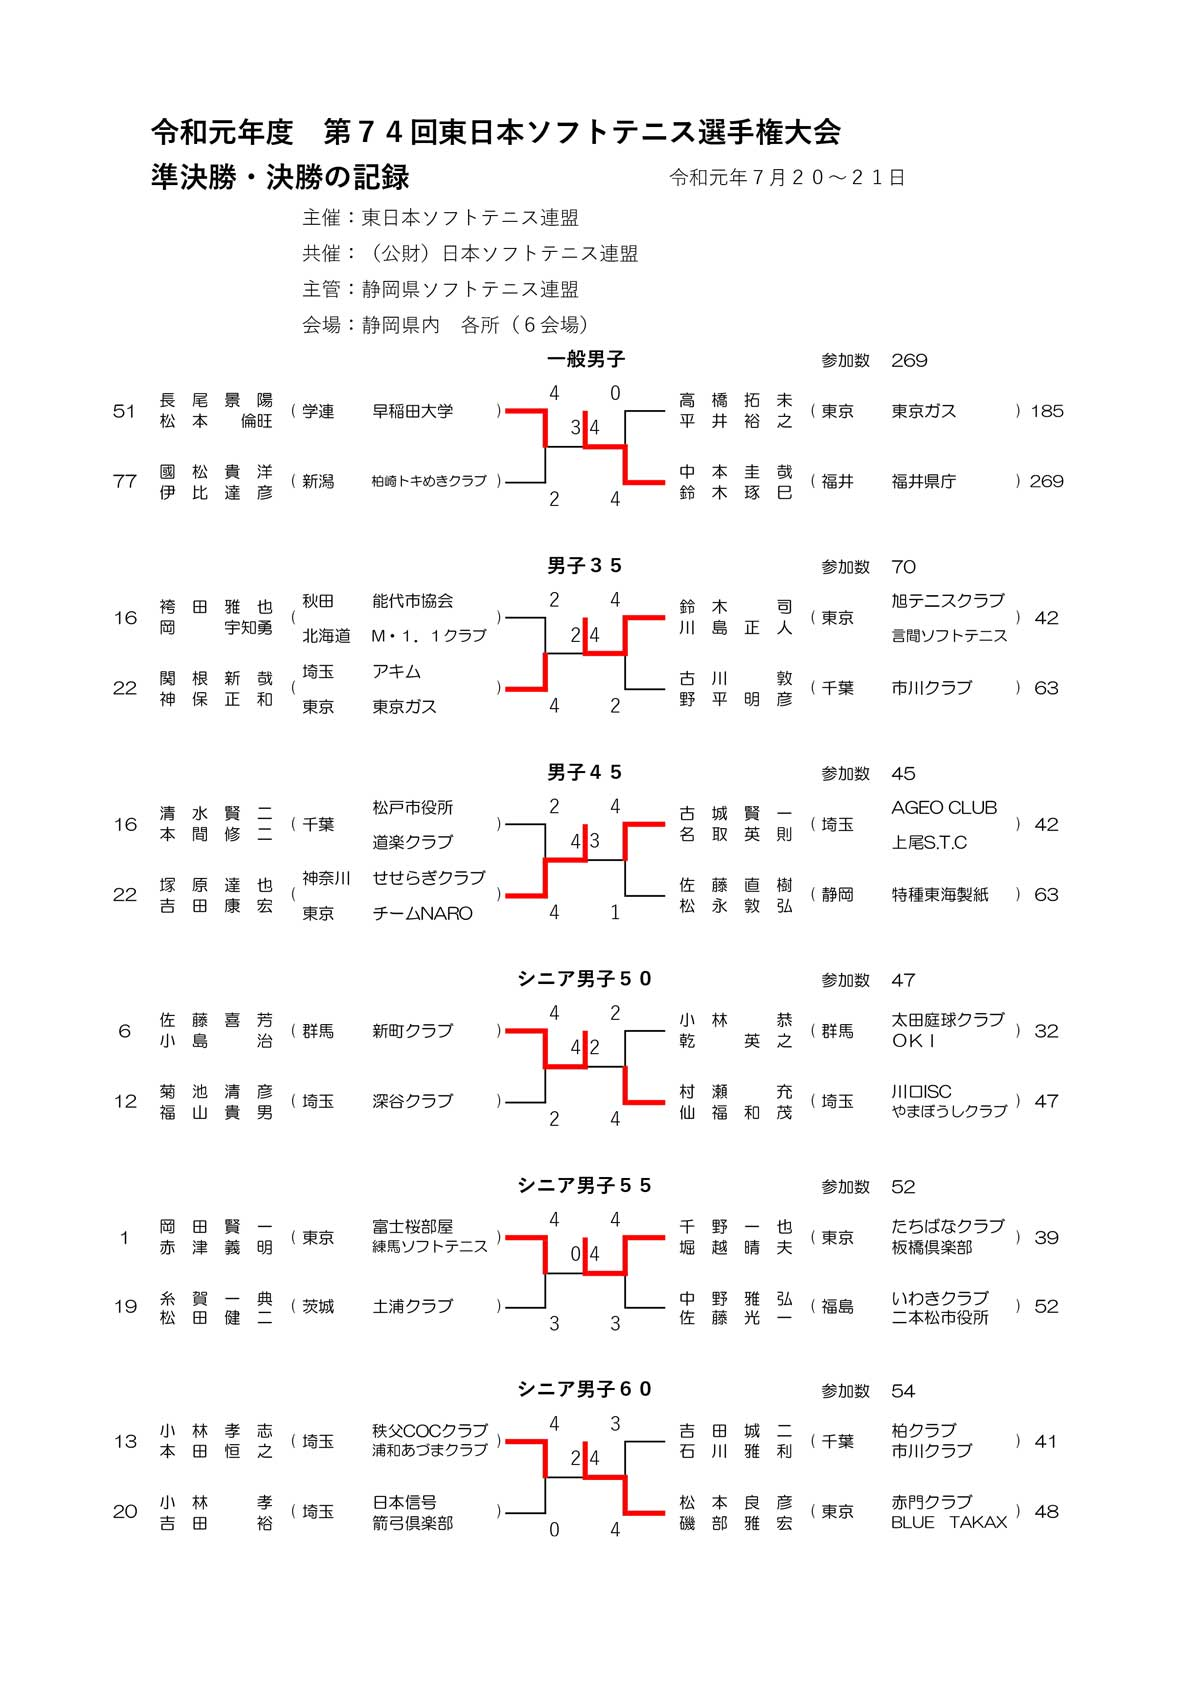 令和元年度(2019)東日本ソフトテニス選手権大会結果